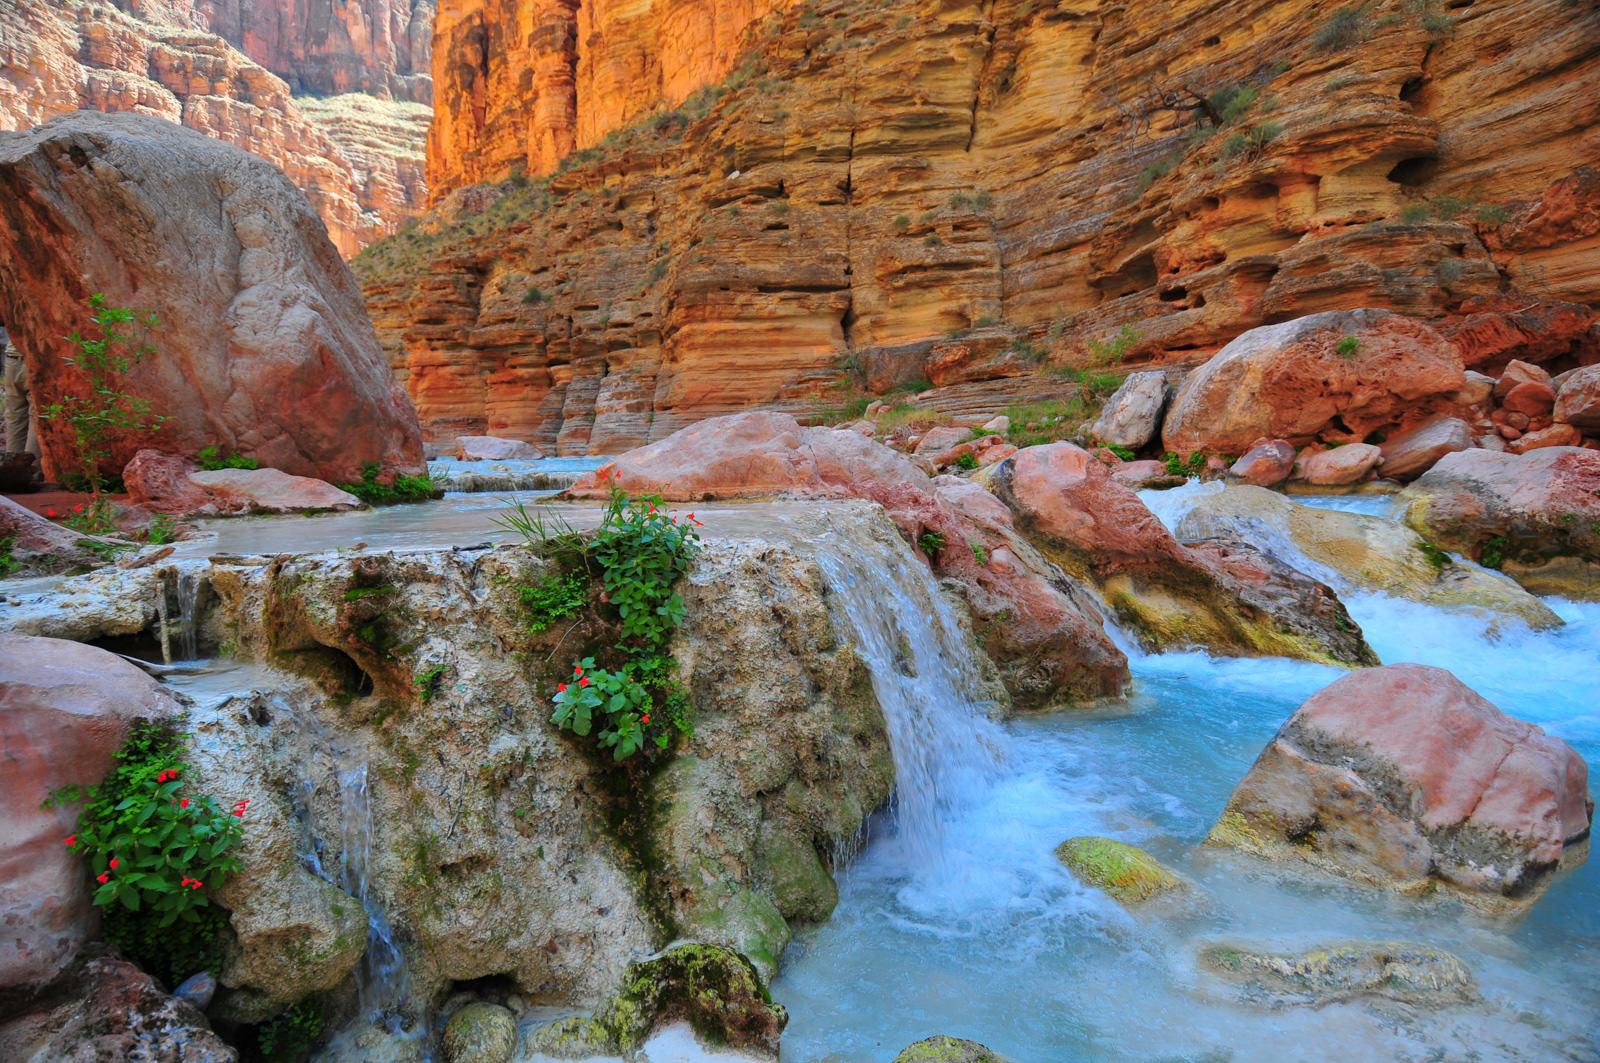 havasu canyon | how to visit havasu from the river